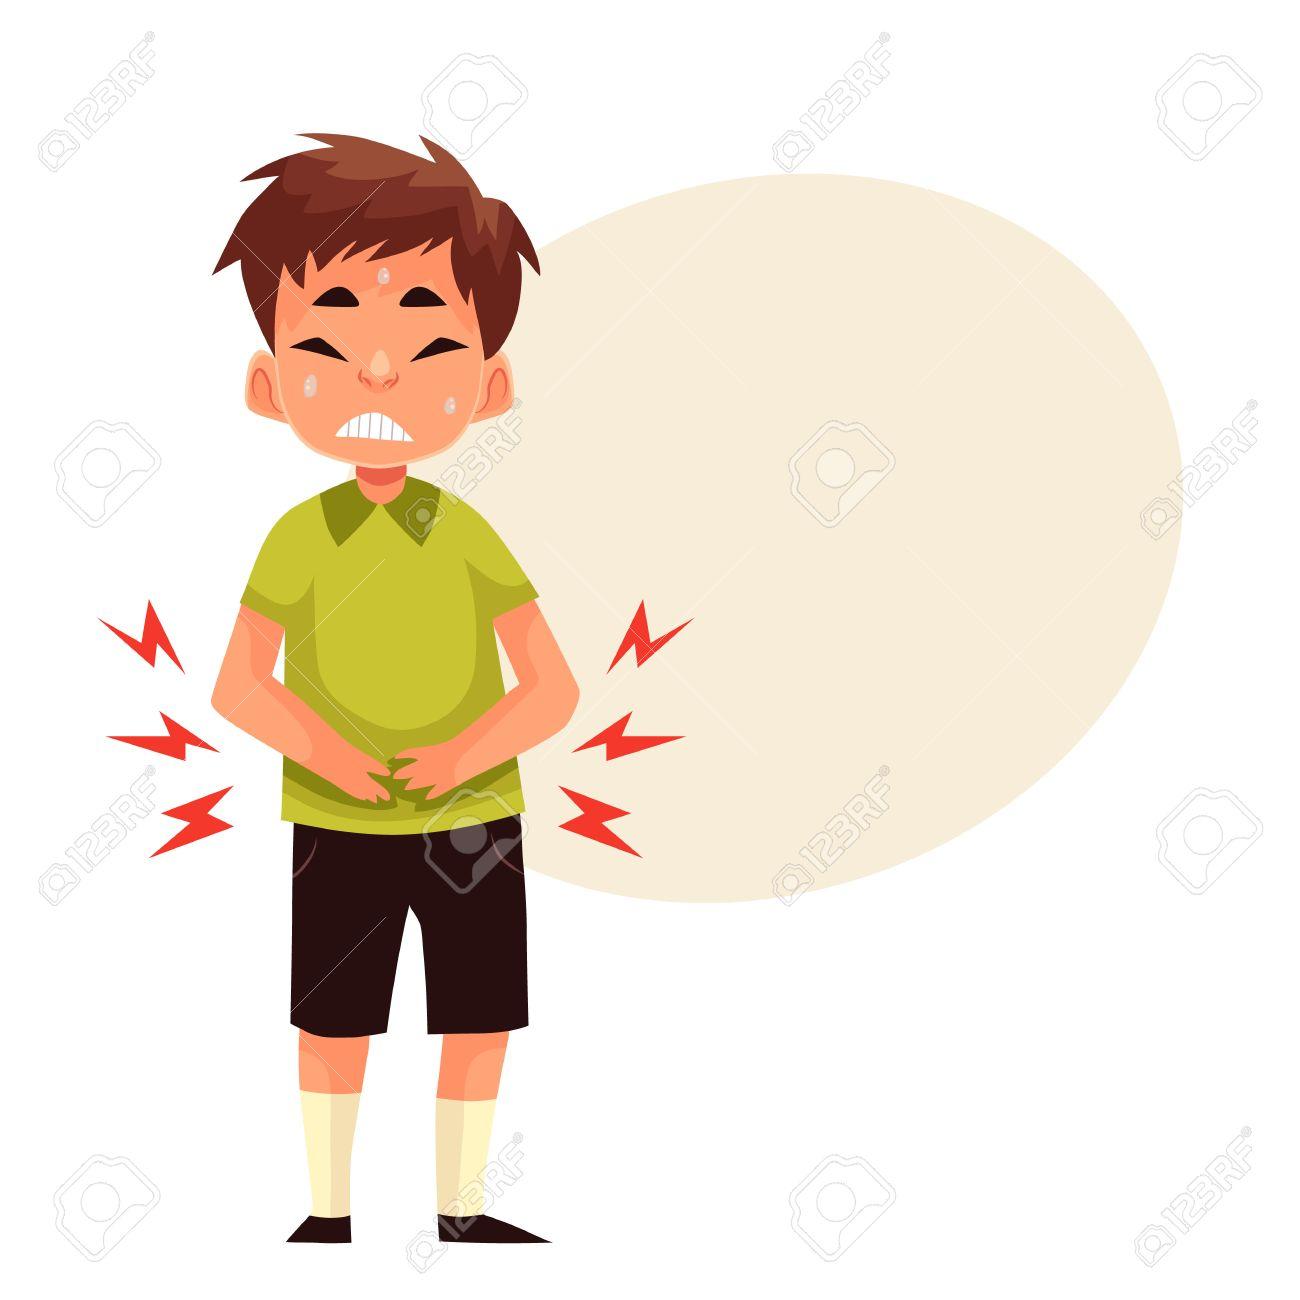 Boy Having Stomach Ache, Carto...